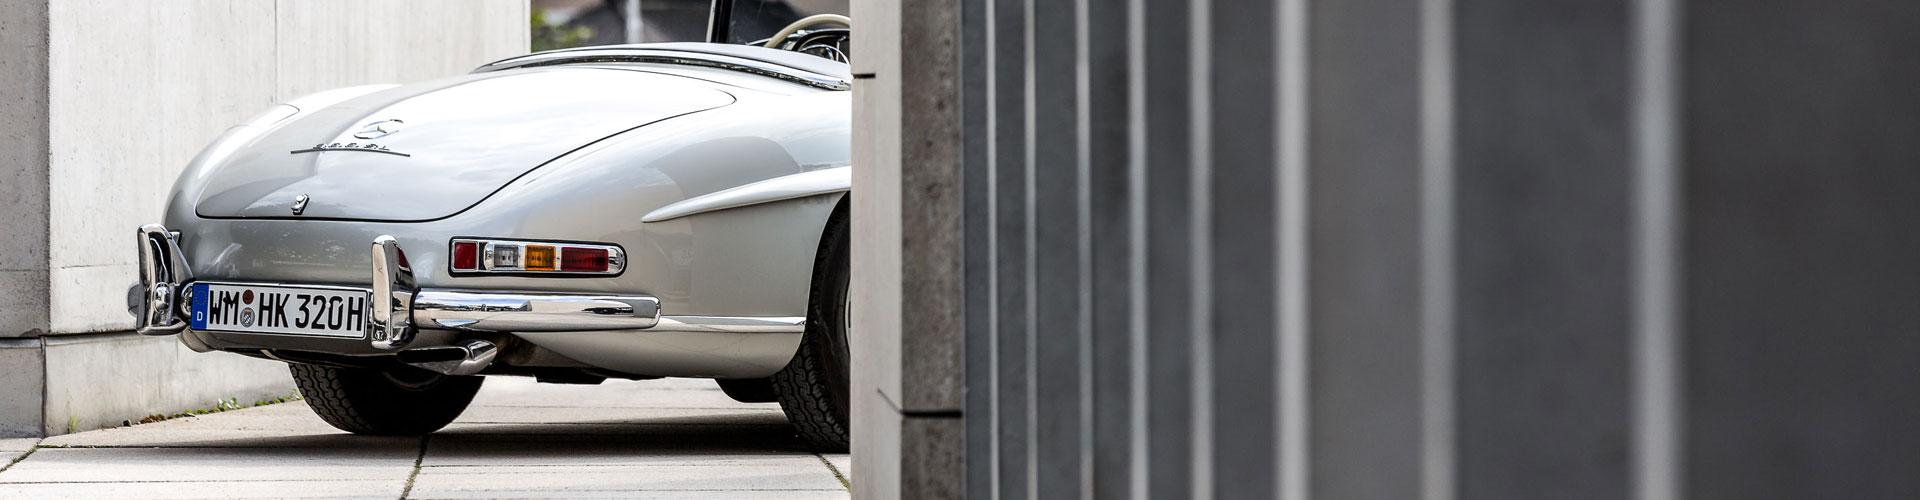 300sl-convertible